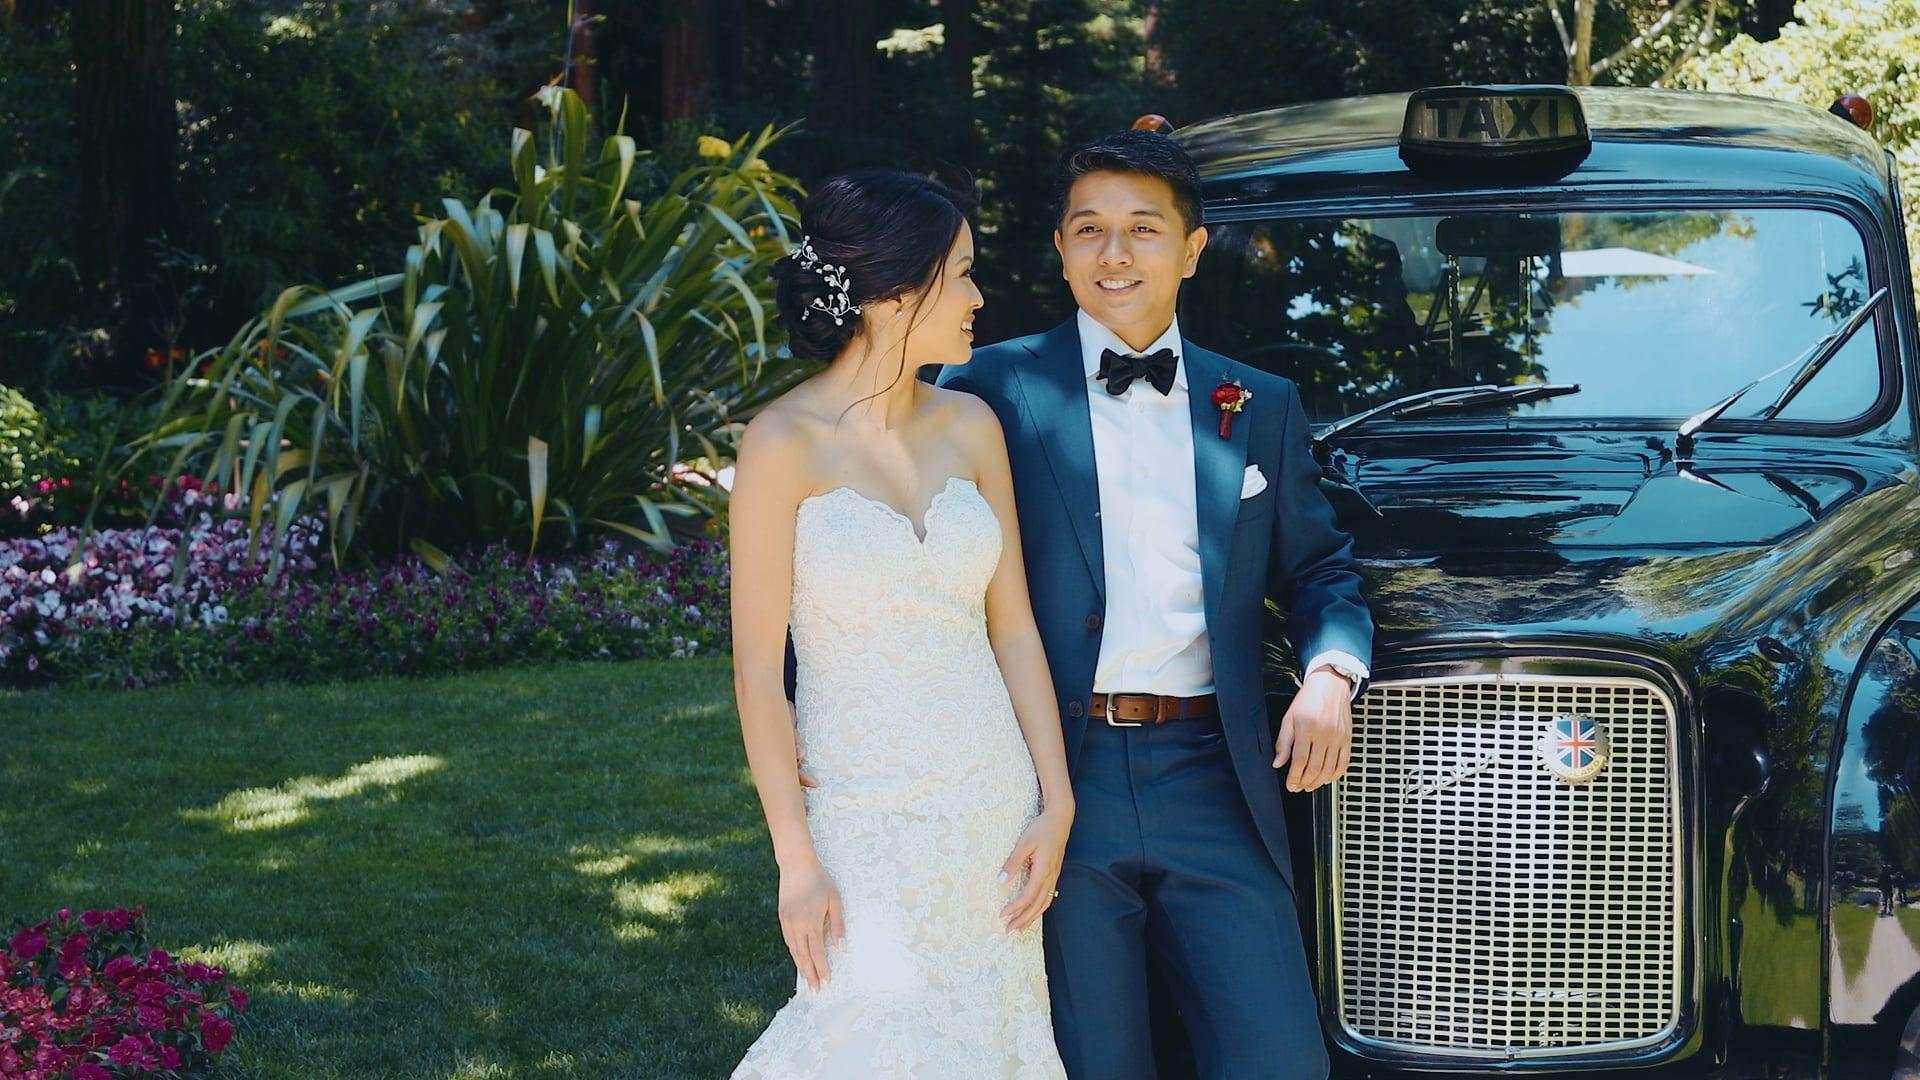 Liane and Vinh